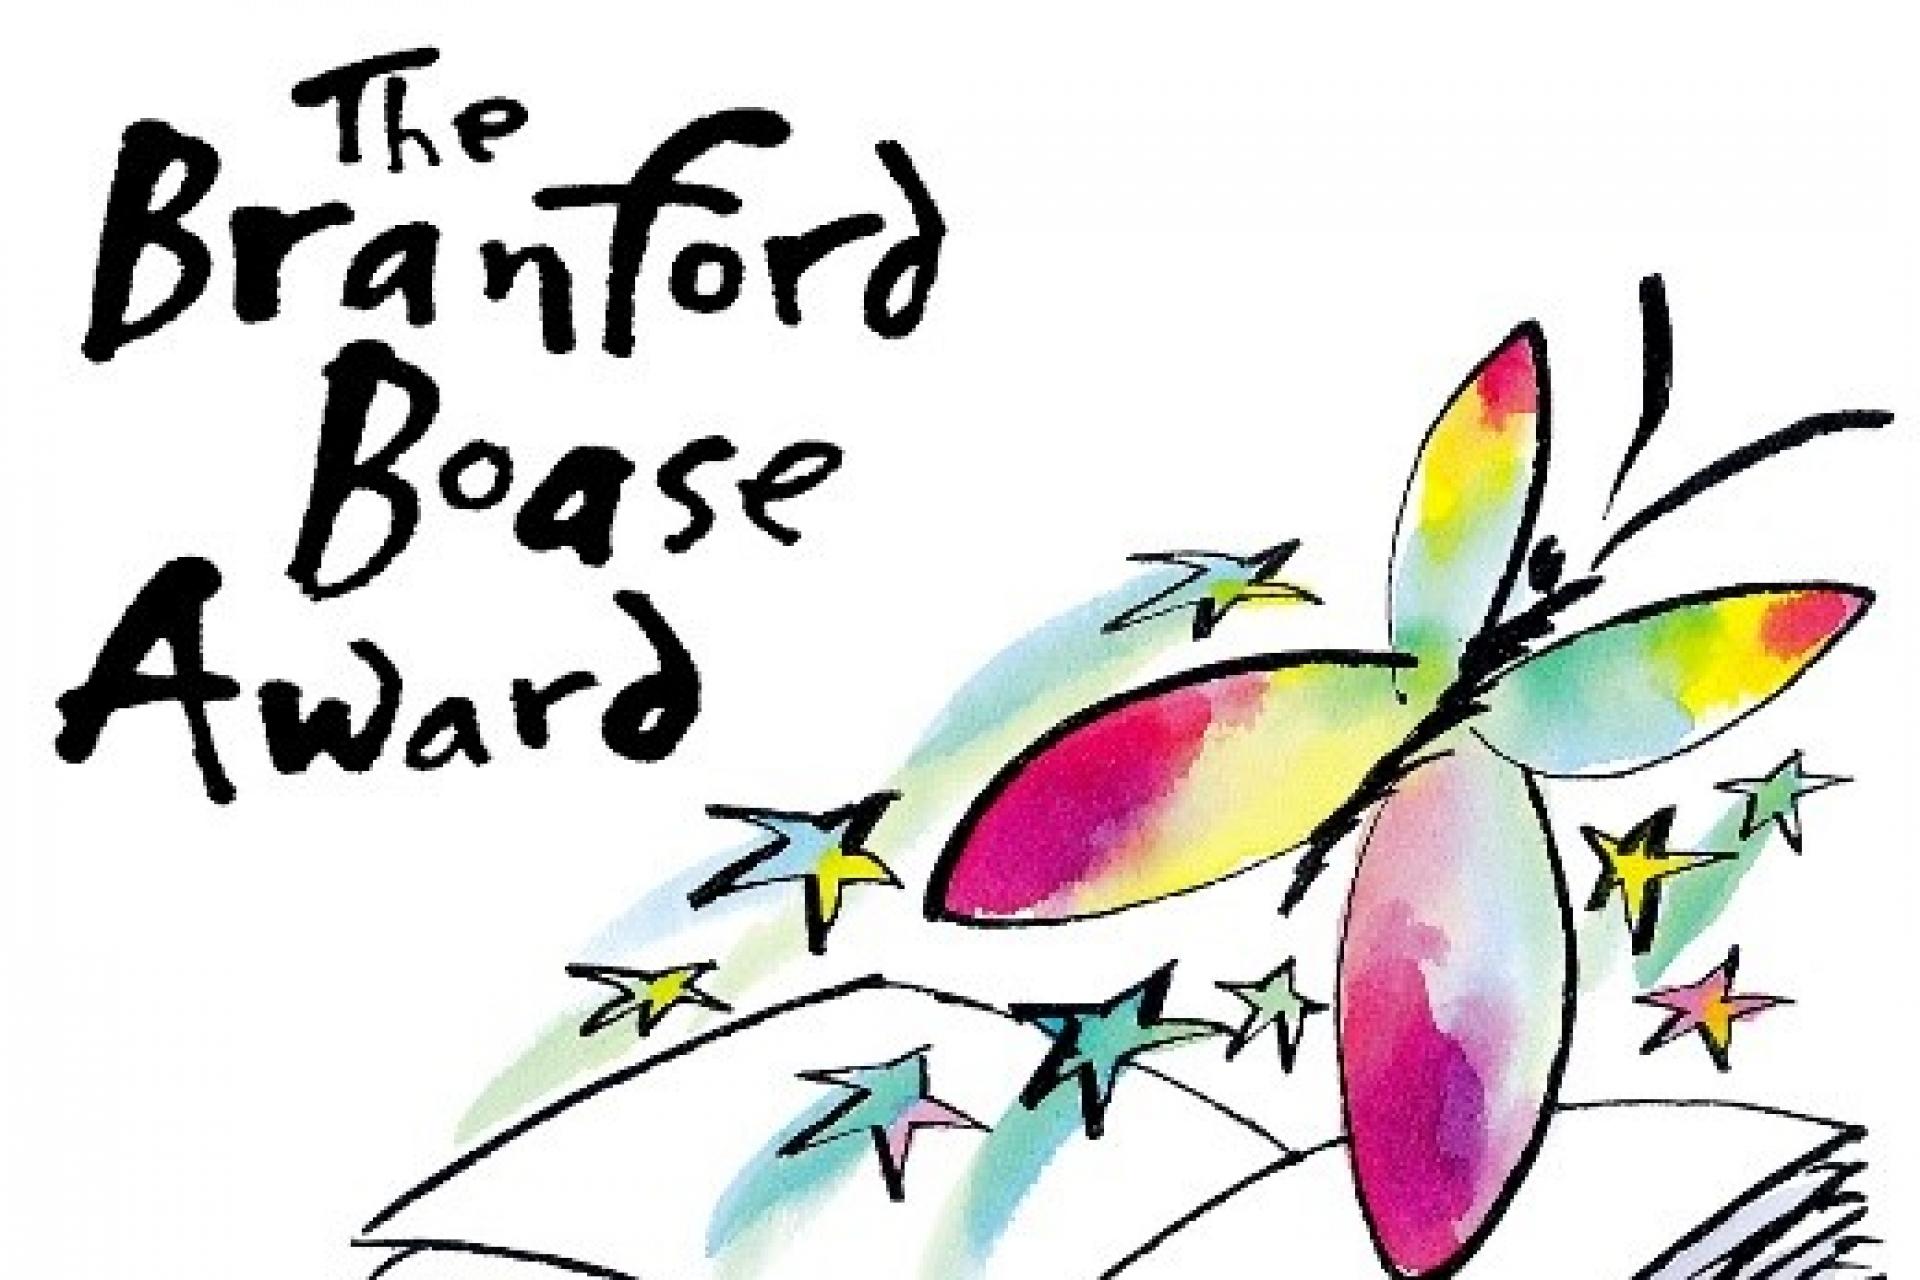 LoveReading LitFest to host the 2021 Branford Boase Award Ceremony in new partnership